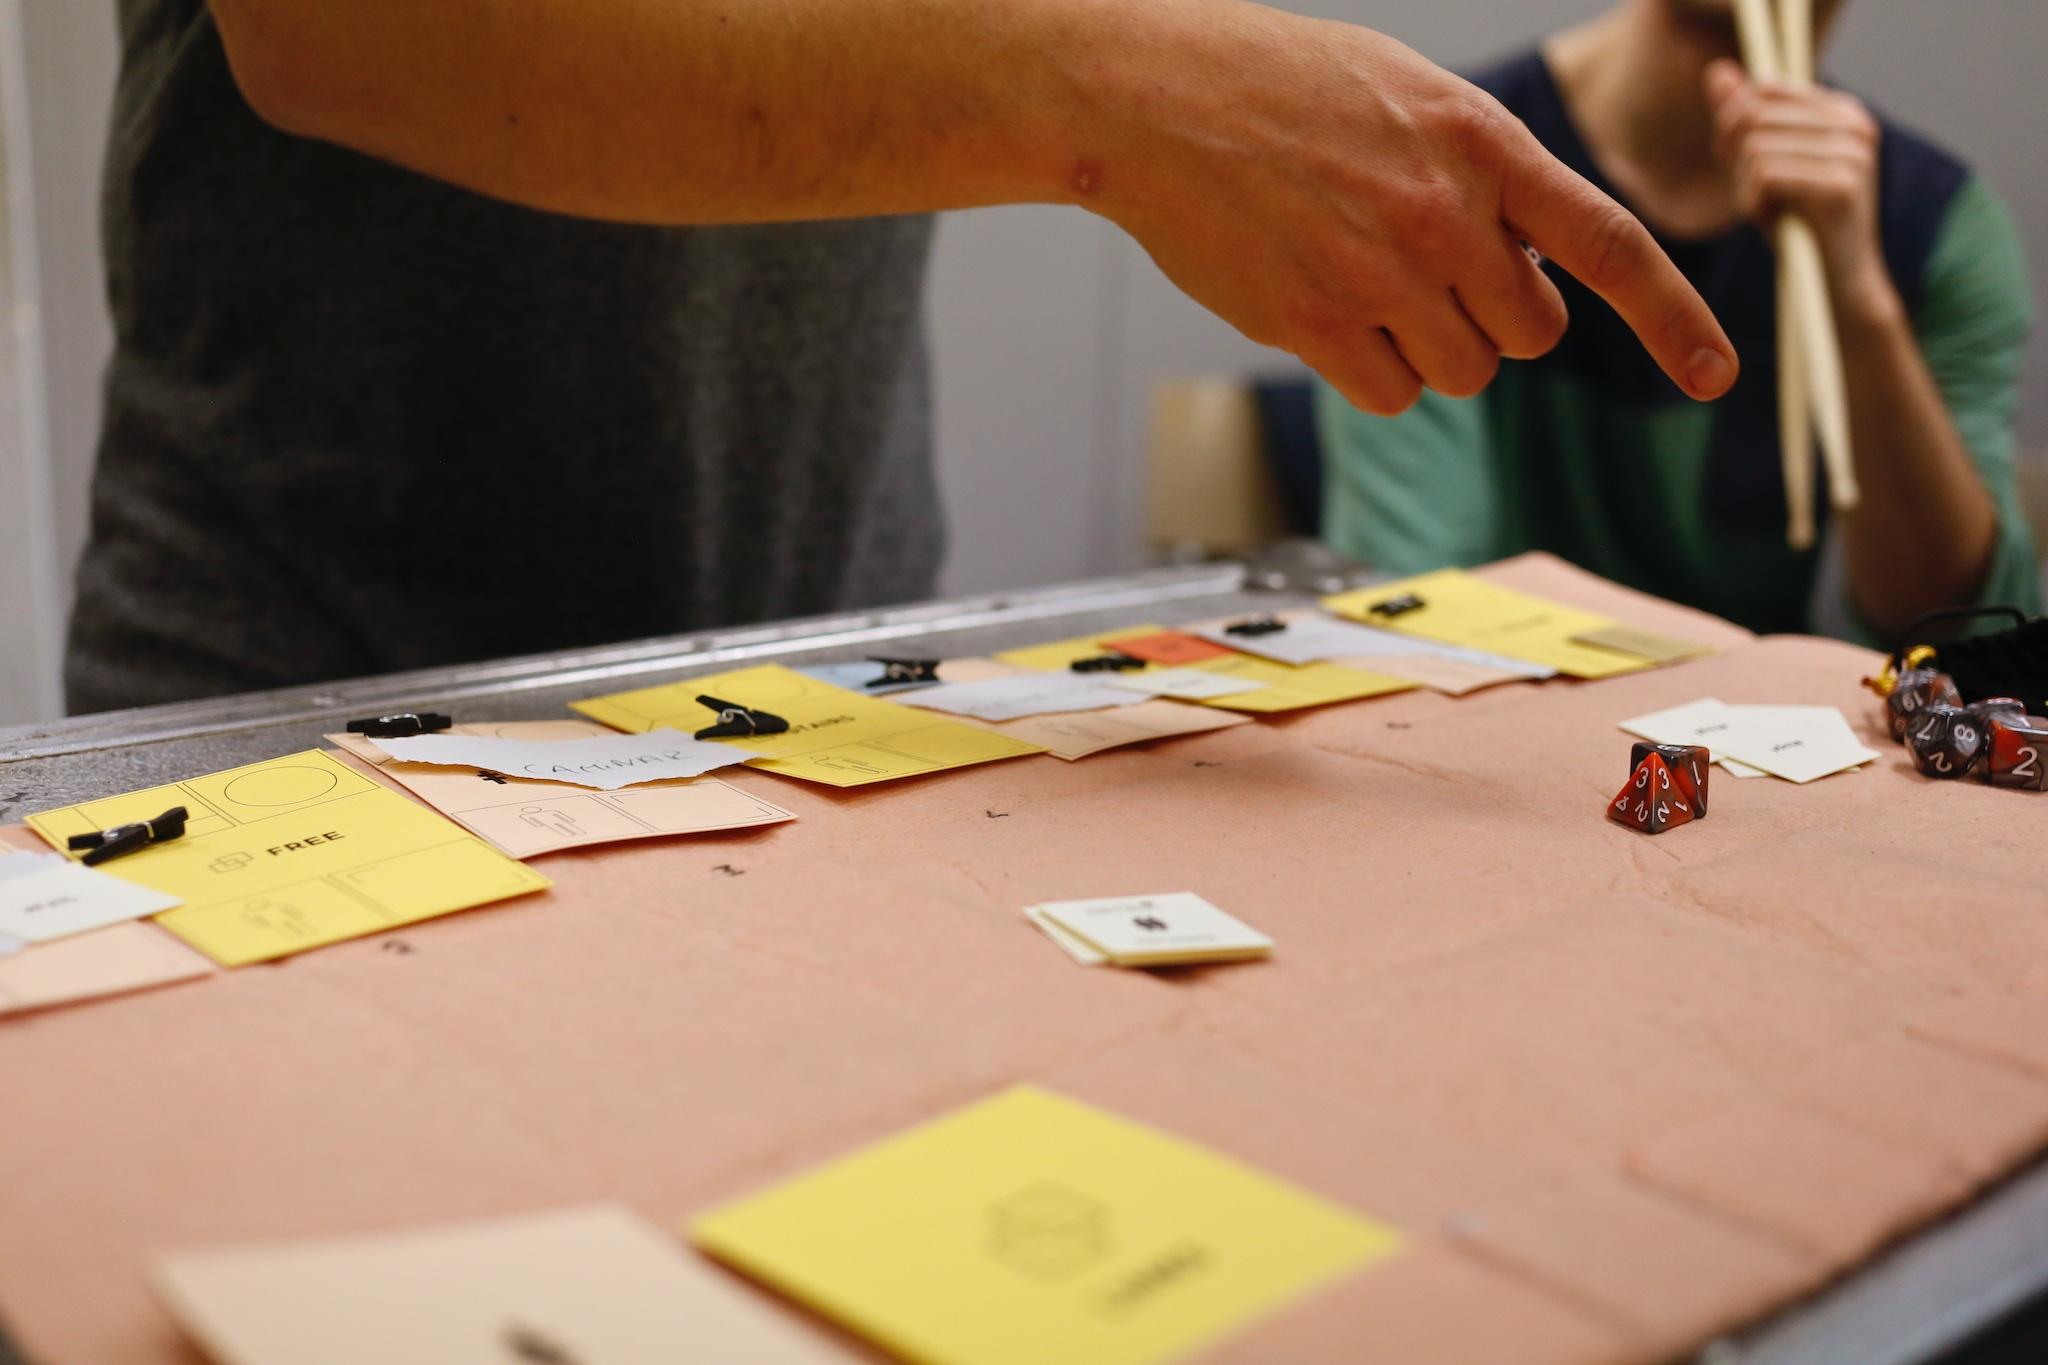 Blog | troposfera.xyz by Dídac Gilabert | Layer Cards amb el Col·lectiu Free't 4